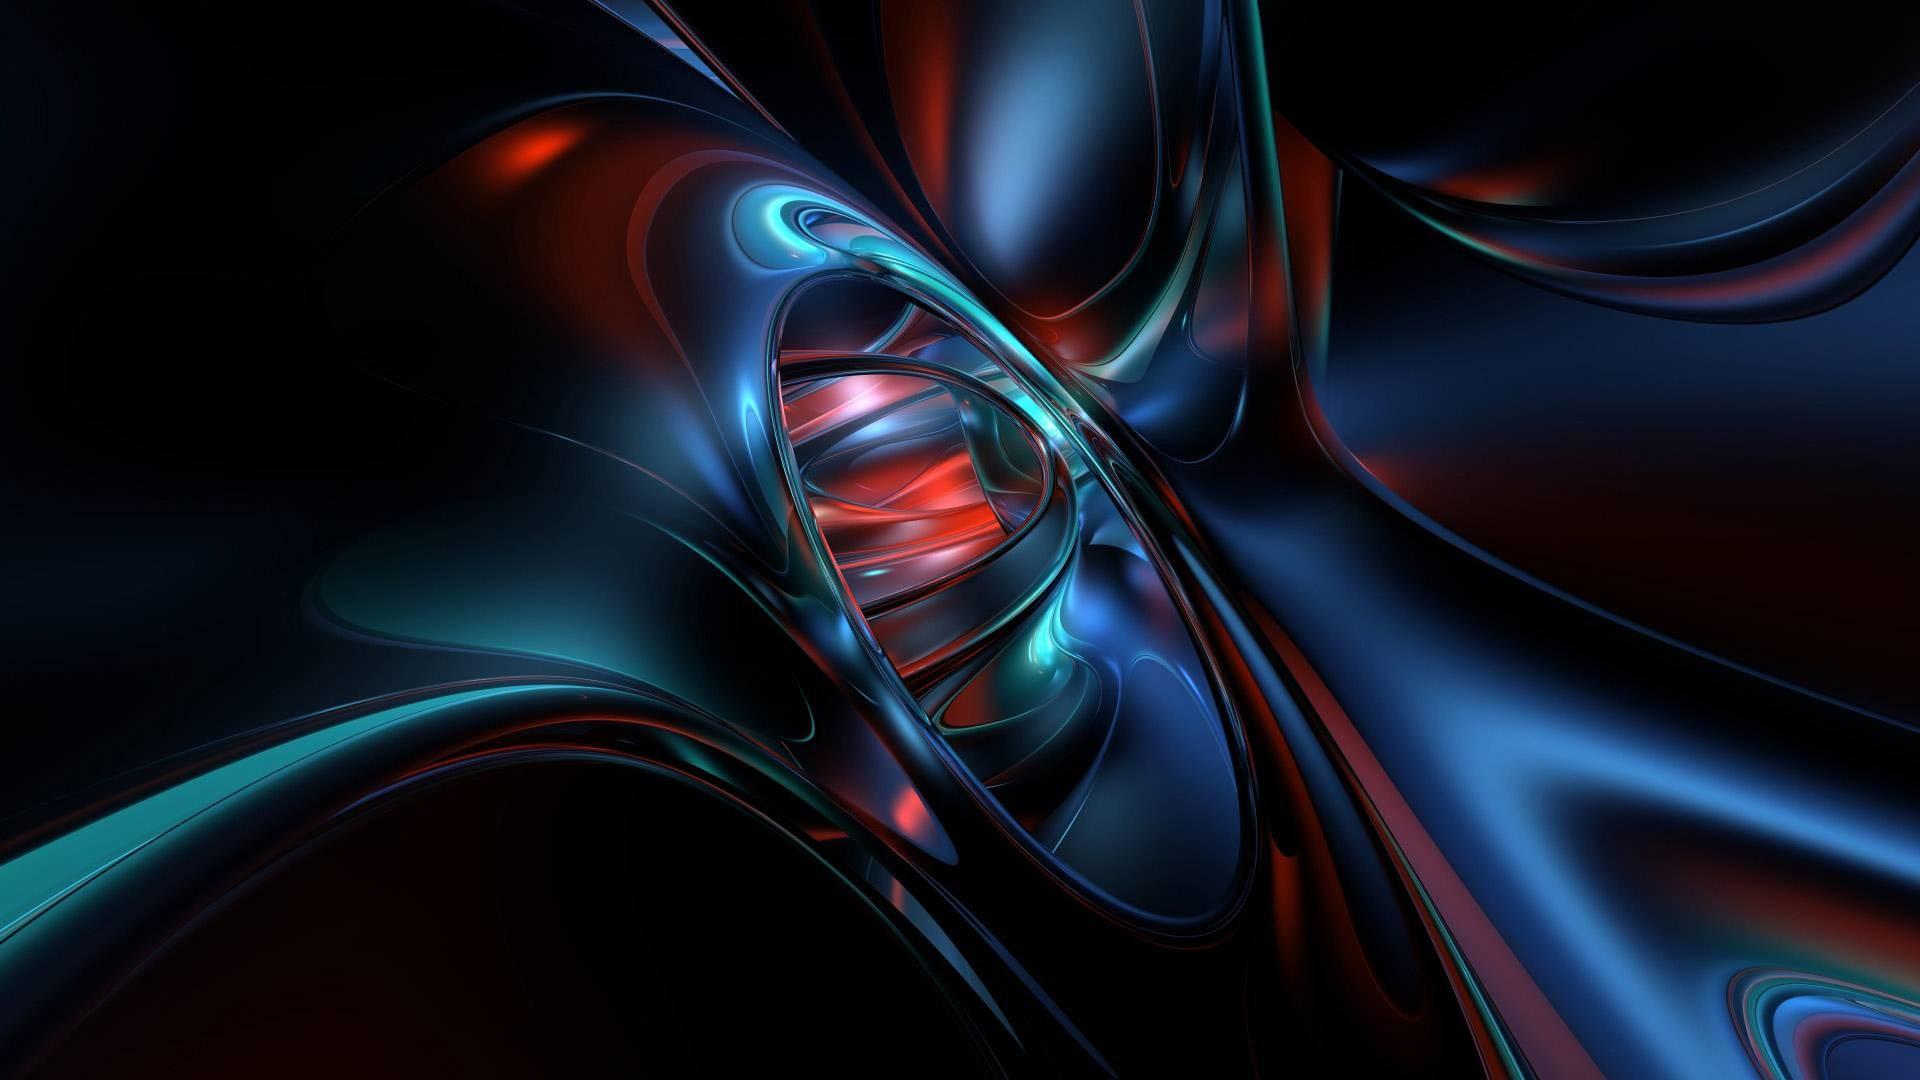 Abstract Metallic Blob Wallpaper